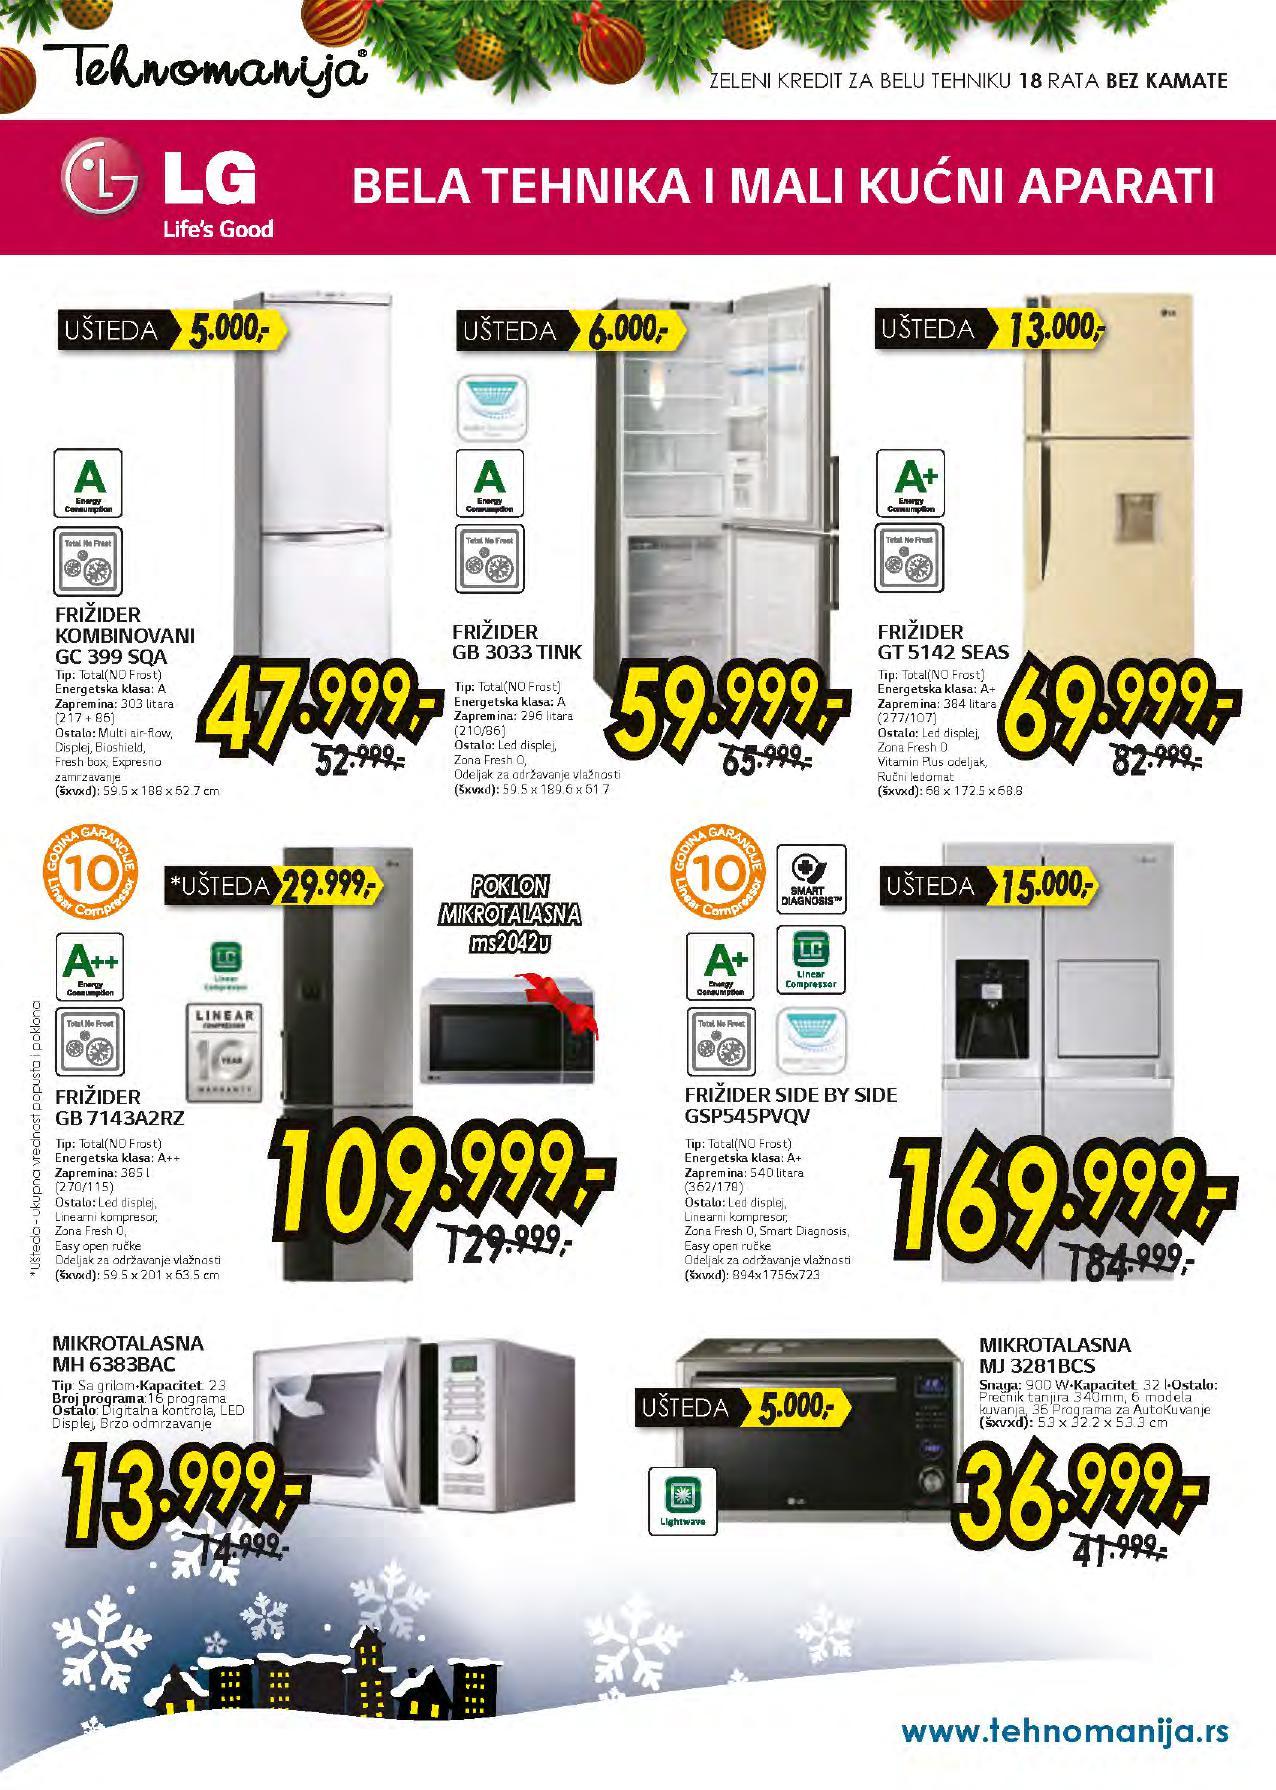 Tehnomanija katalog LG proizvodi po super ceni